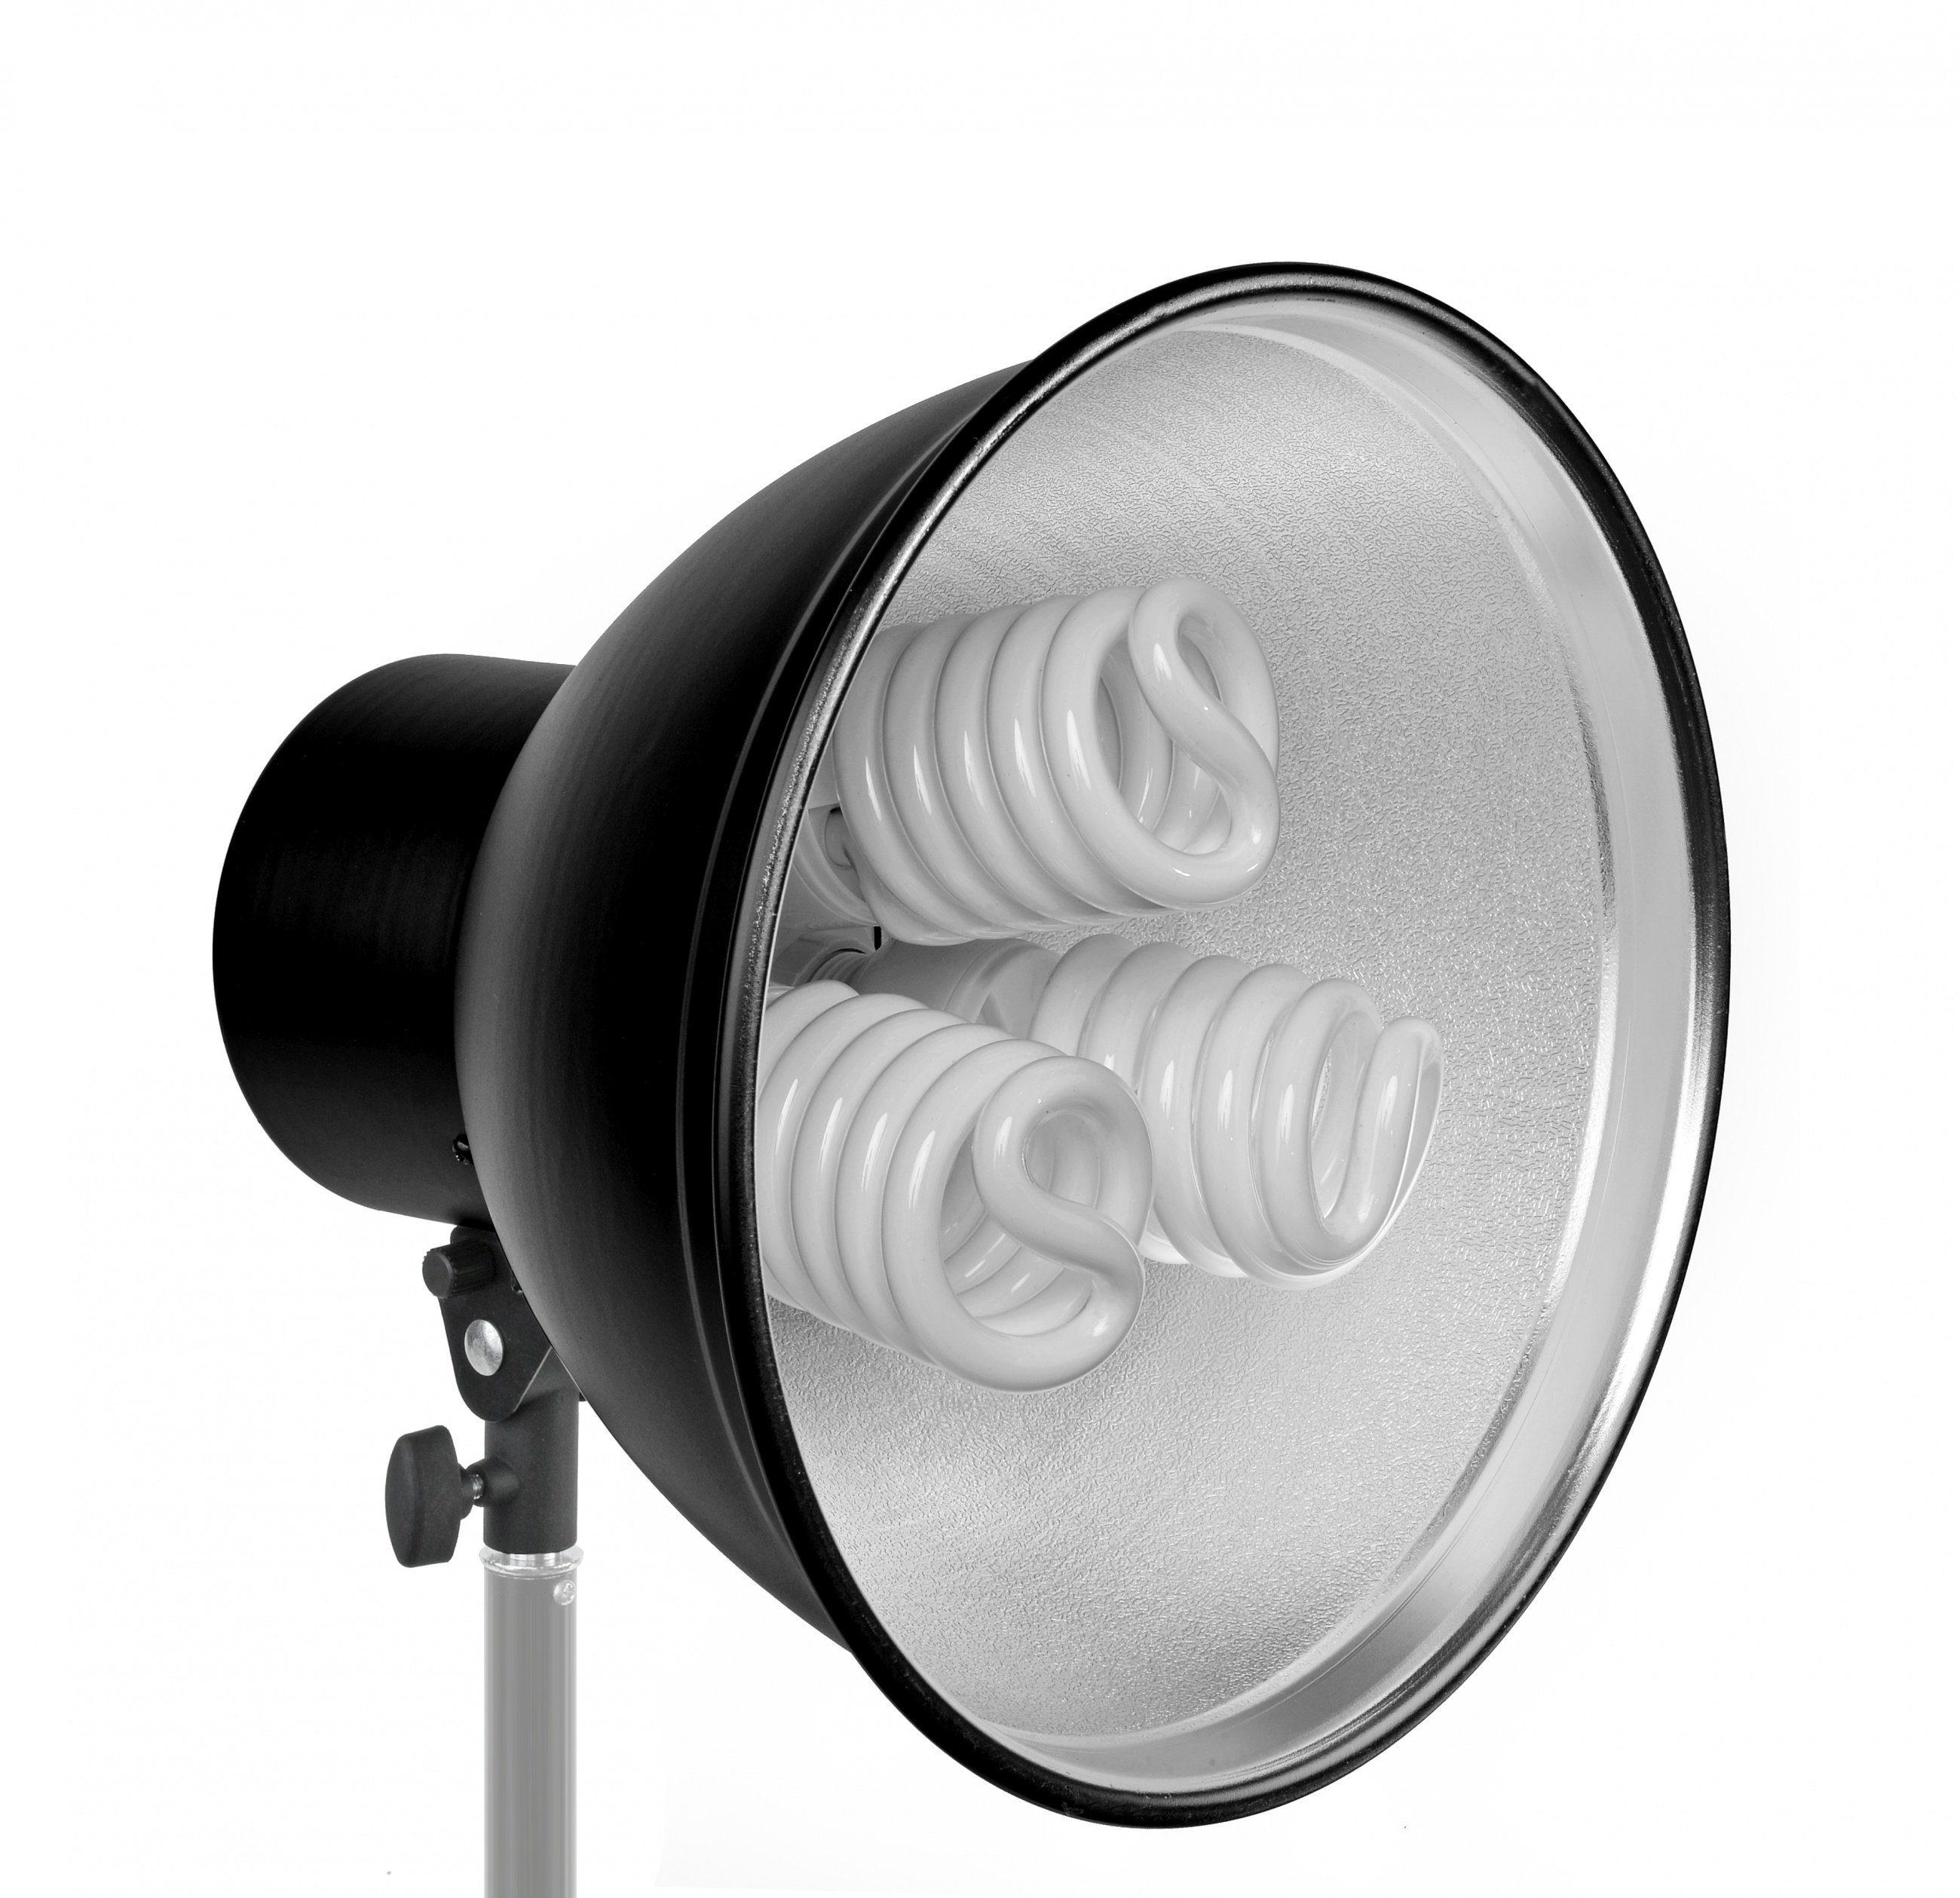 BRESSER Fotostudio »BRESSER MM-12 Lampenhalter 31cm für 3 Lampen«